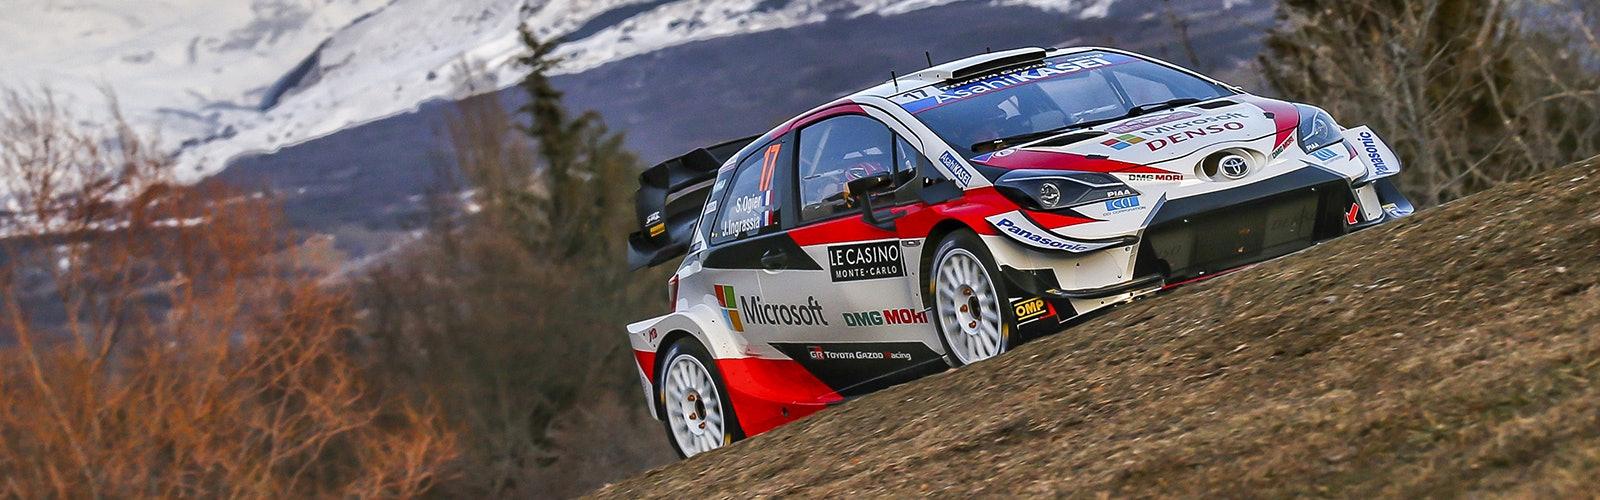 Sebastien Ogier Toyota Monte Carlo Rally WRC 2020